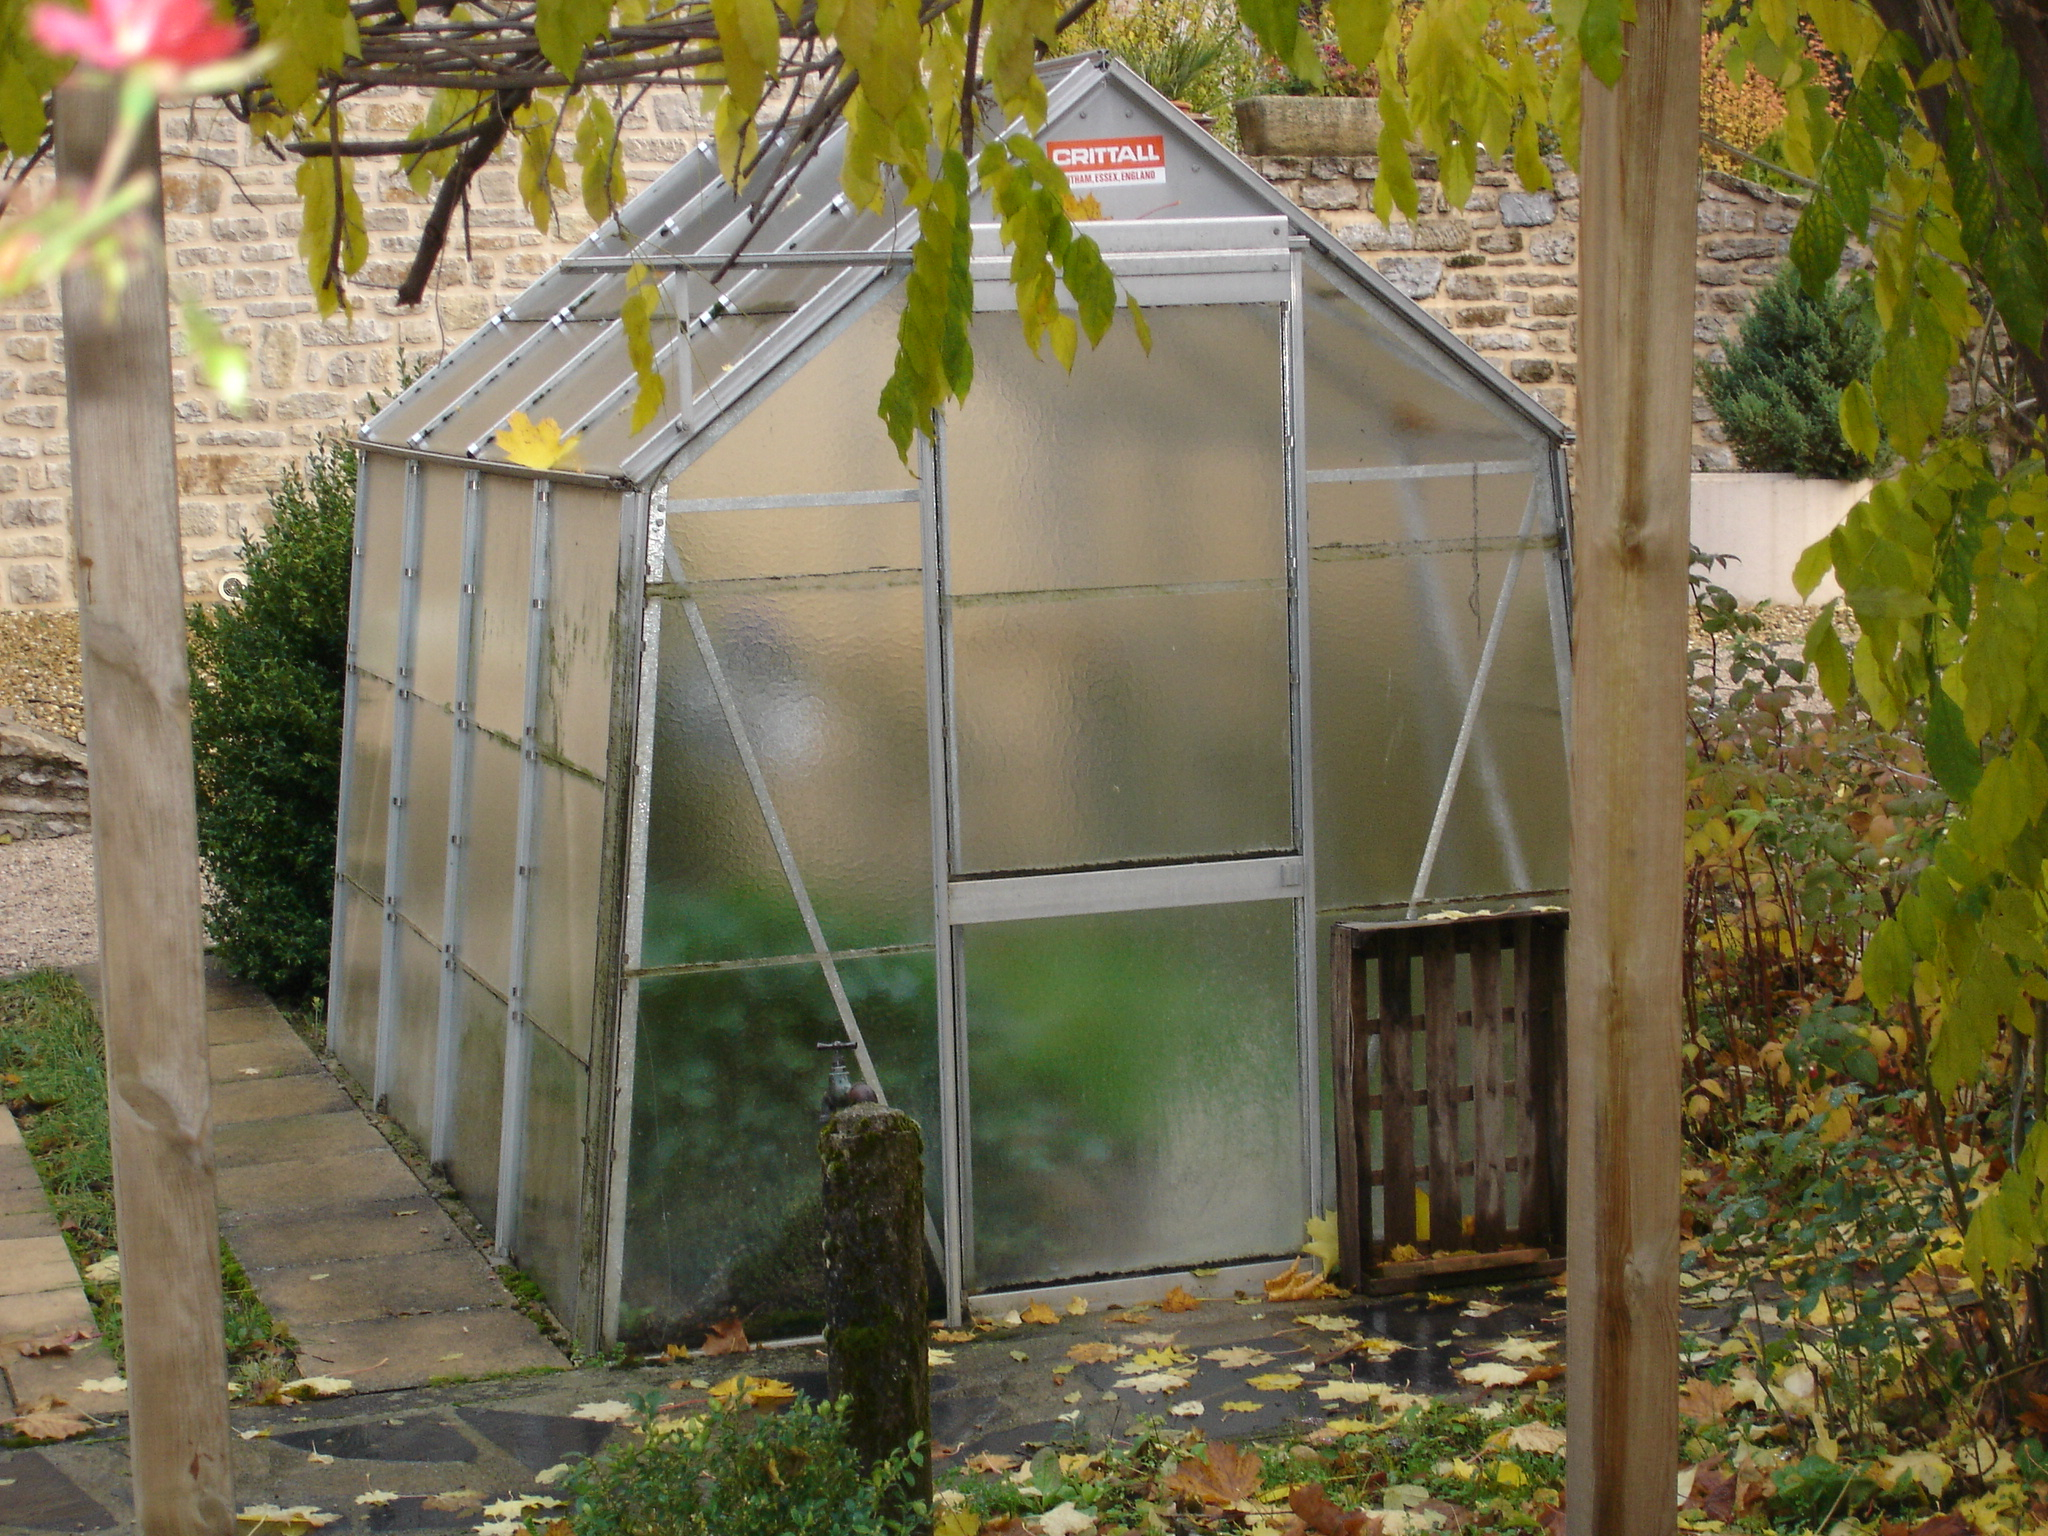 Serre De Jardin Adossee Sur Mesure Dbg Classics | Serre De ... destiné Serre De Jardin D Occasion